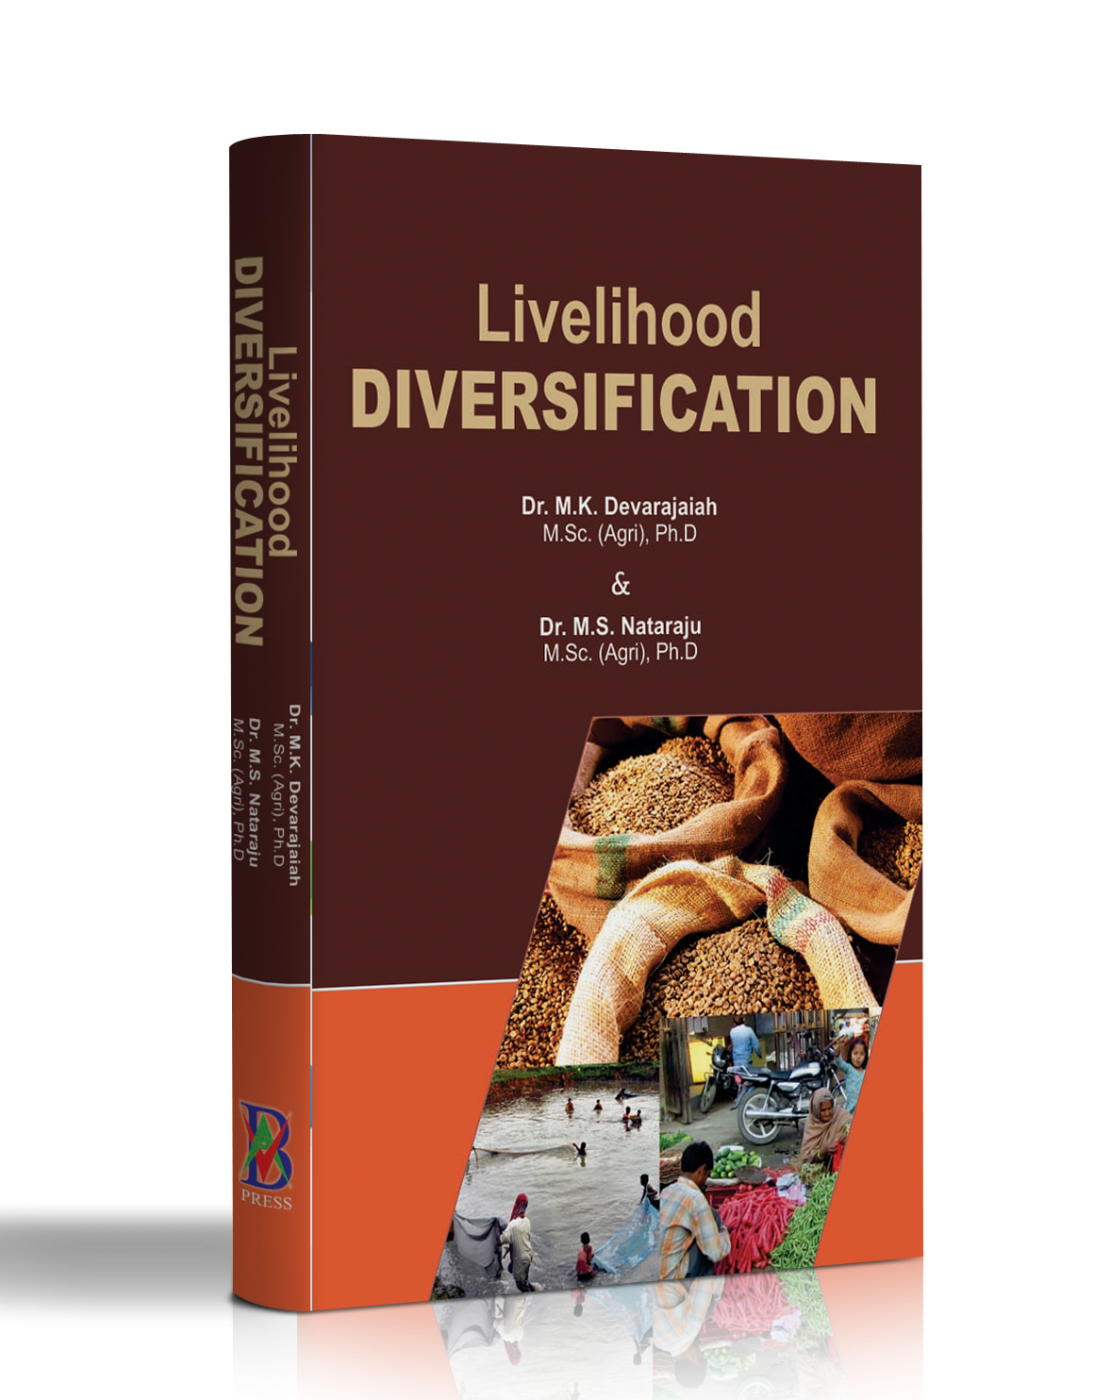 LIVELIHOOD-DIVERSIFICATION